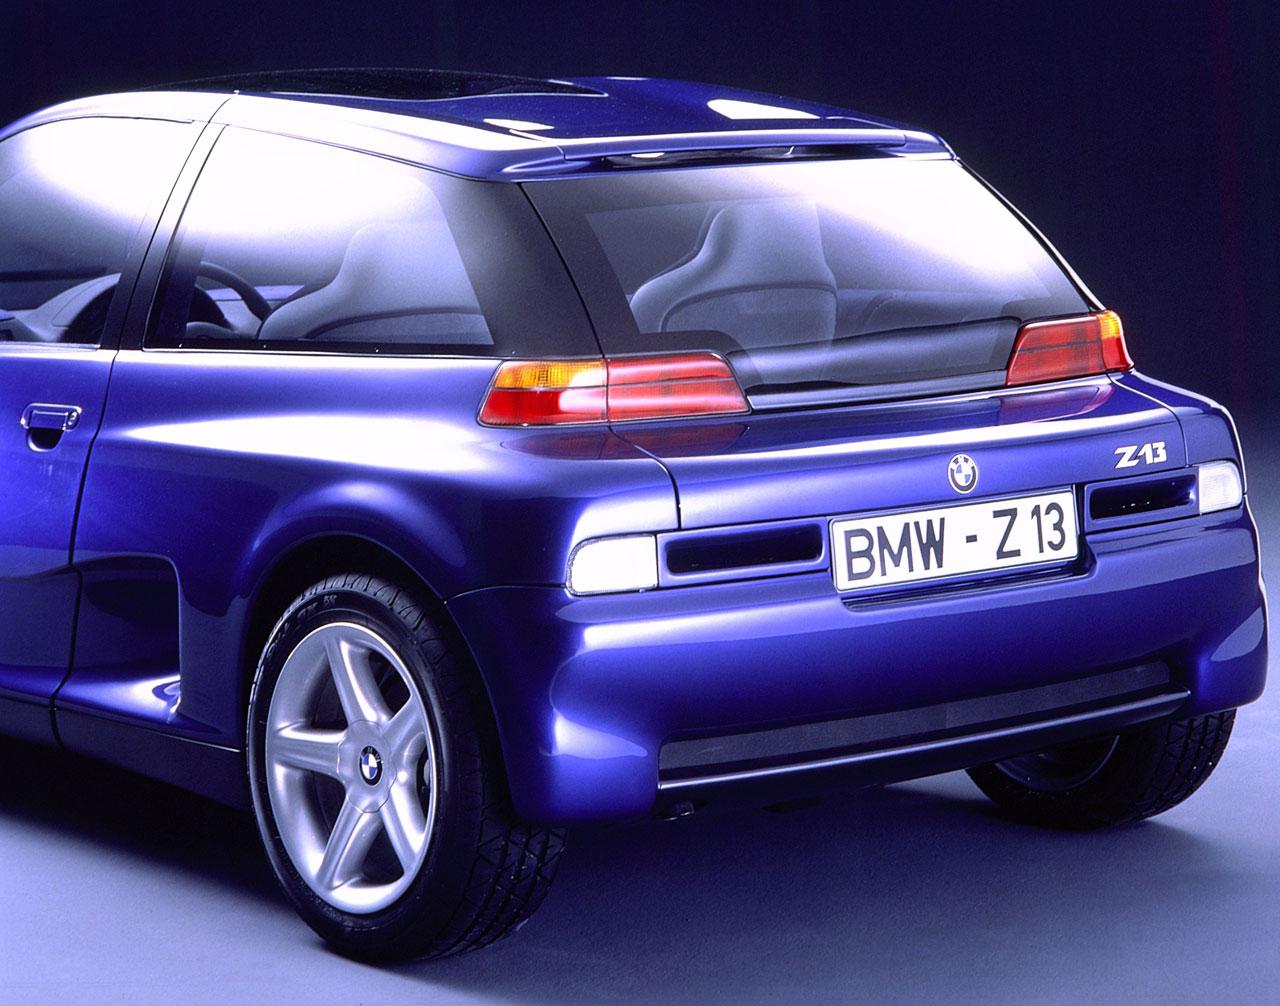 BMW secret concepts: 25 Years of BMW Technik GmbH - Page 7 - Car ...